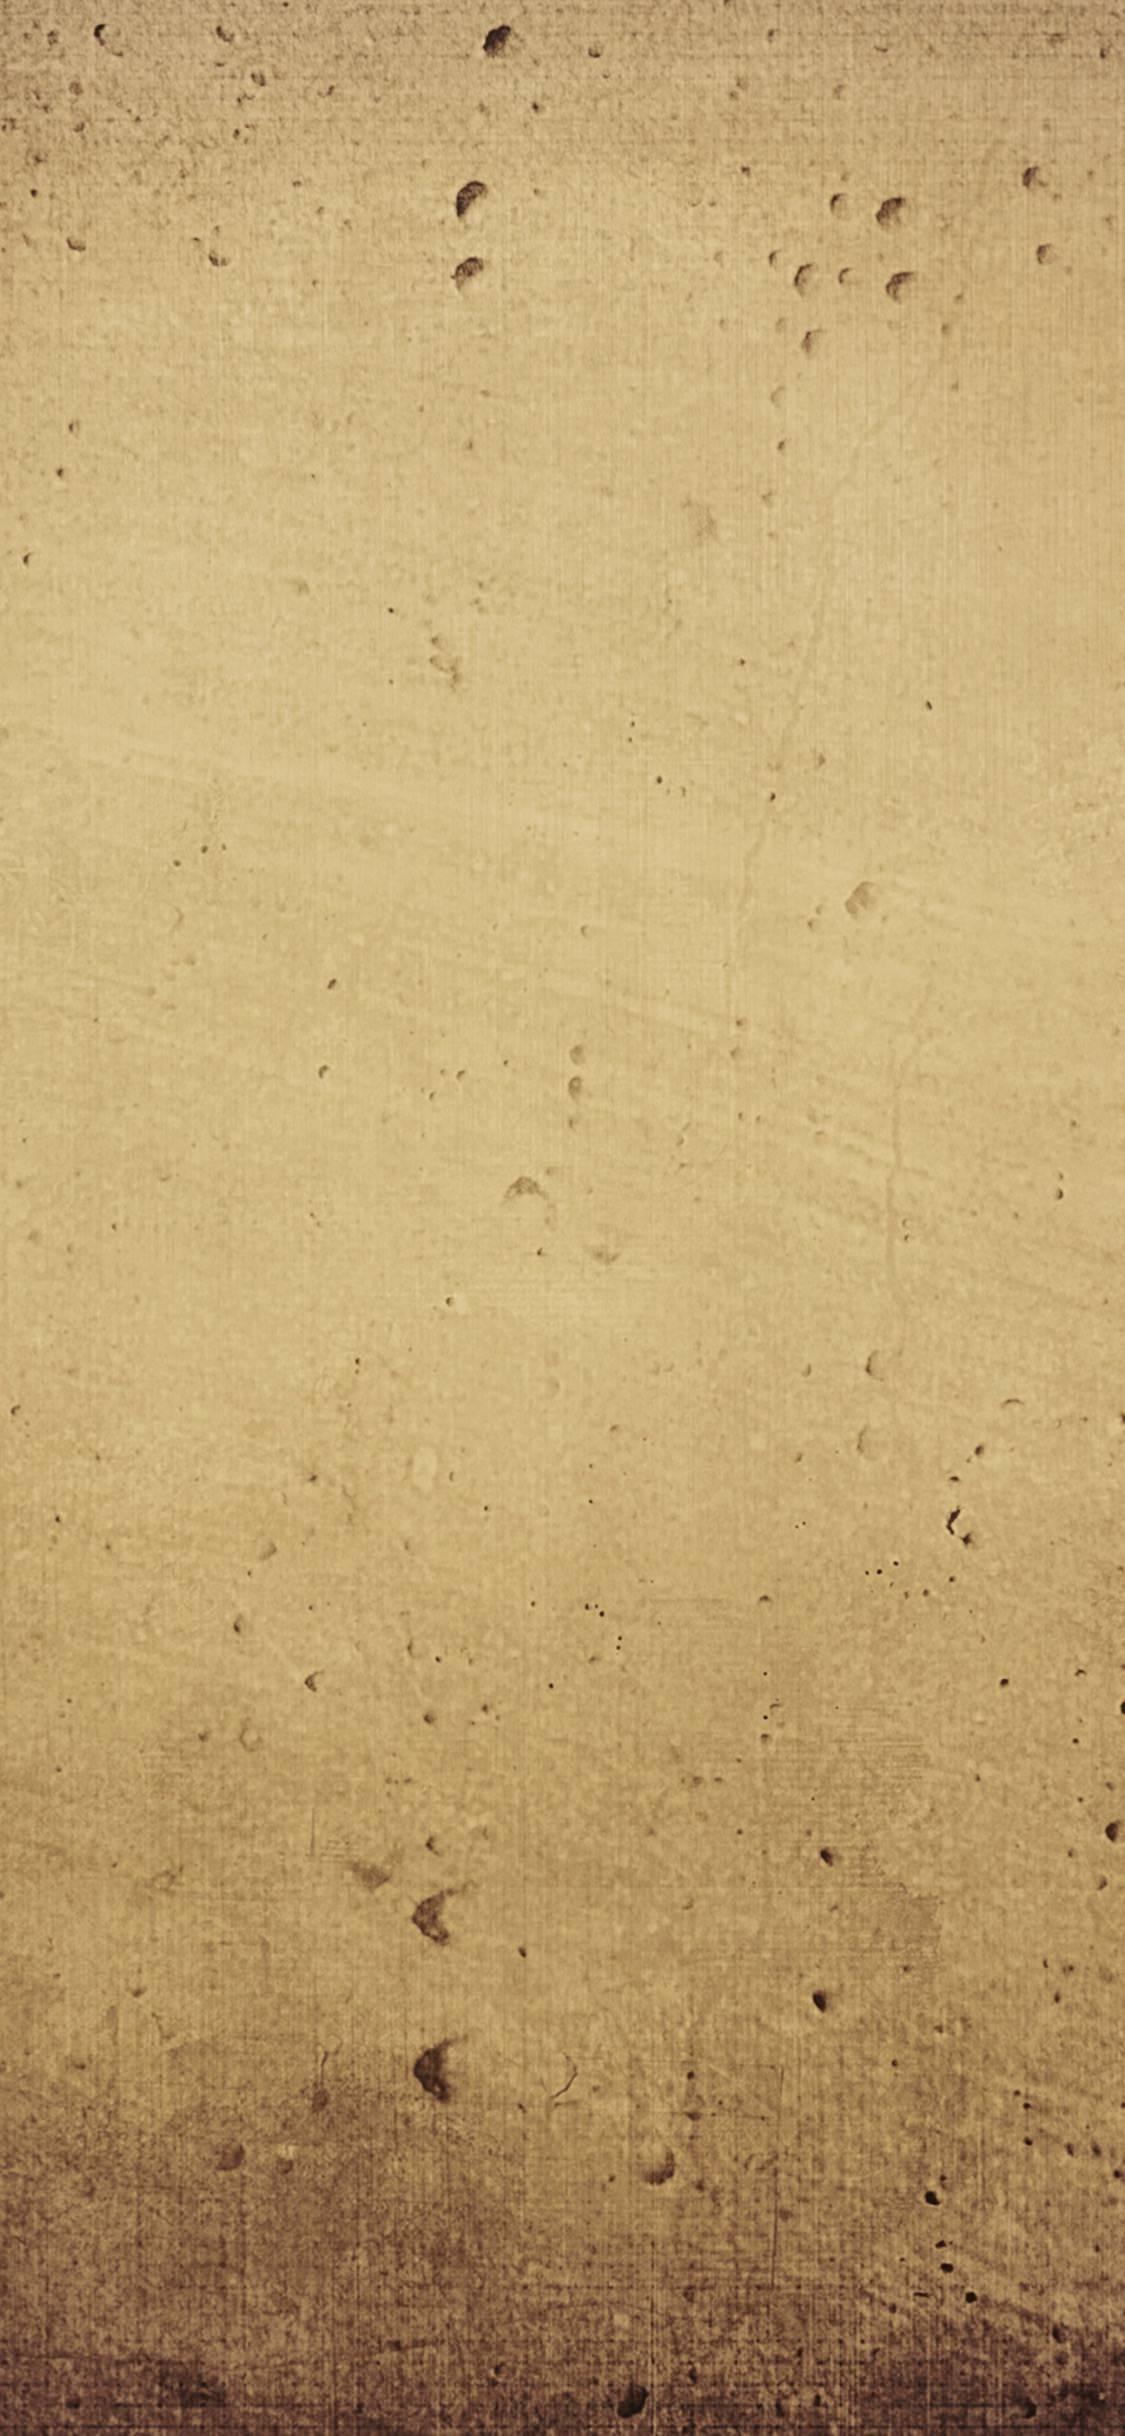 iPhone XS , iPhone X wallpaper 0409